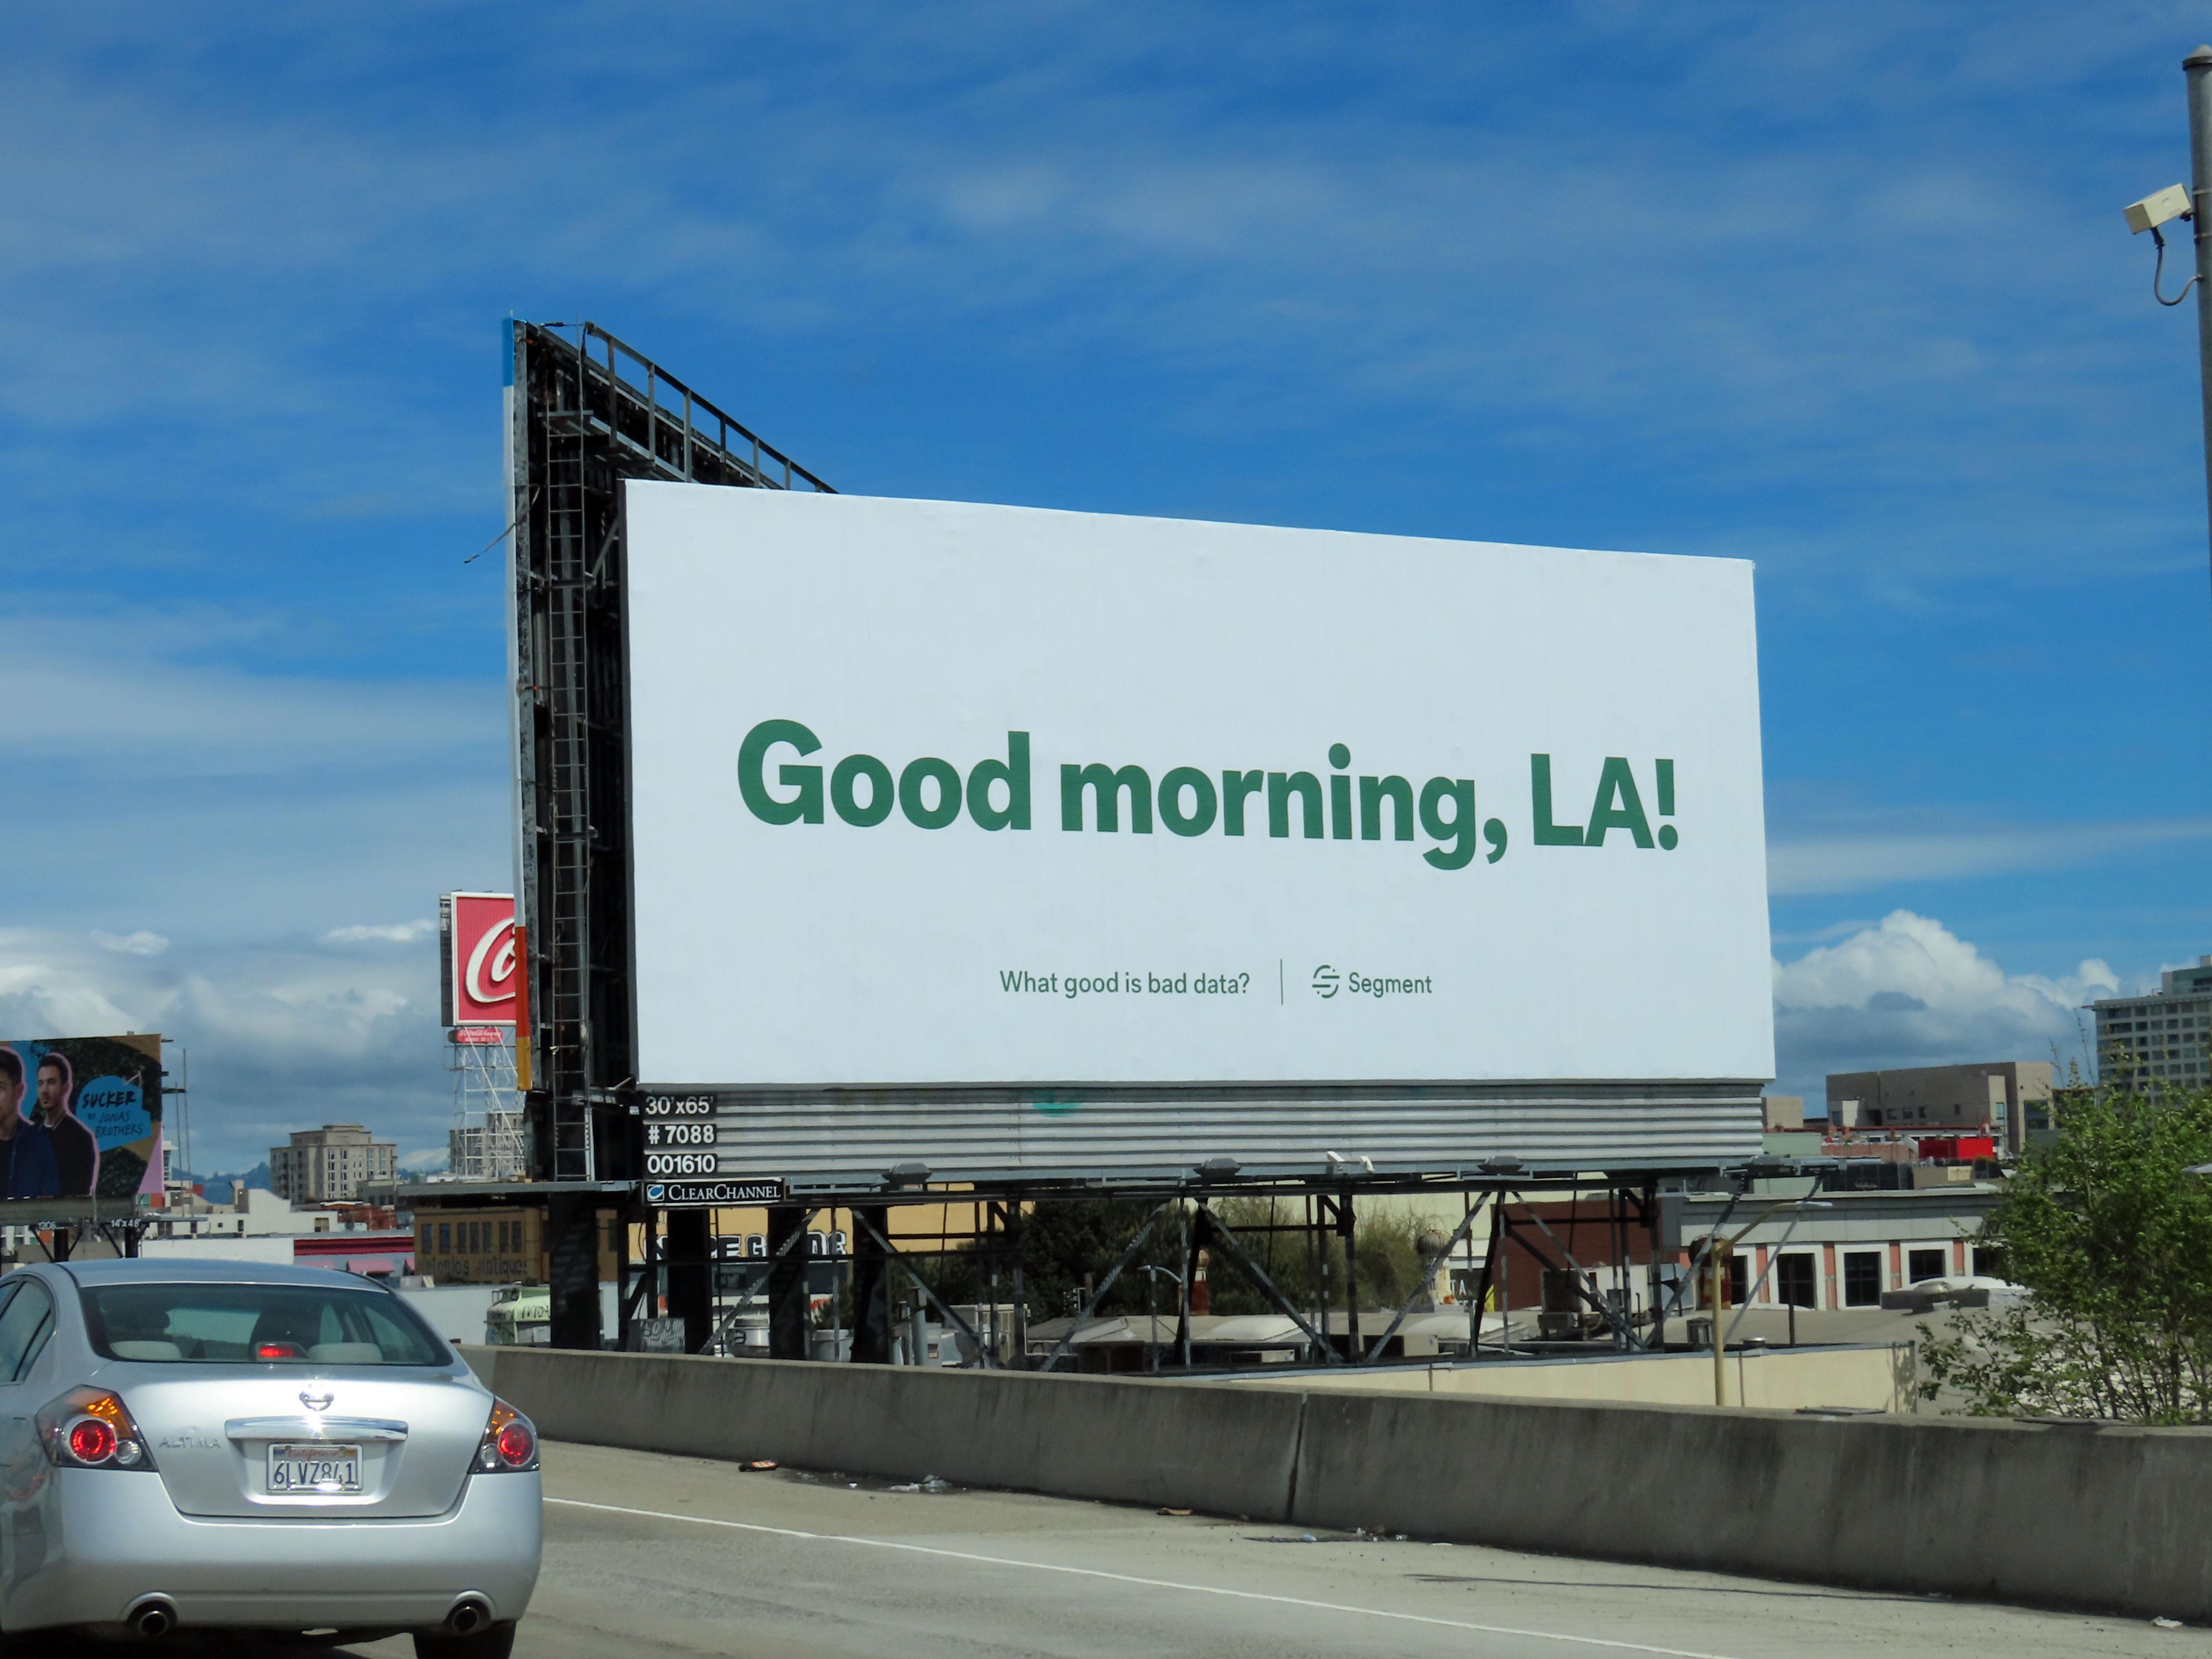 Our billboard in San Francisco